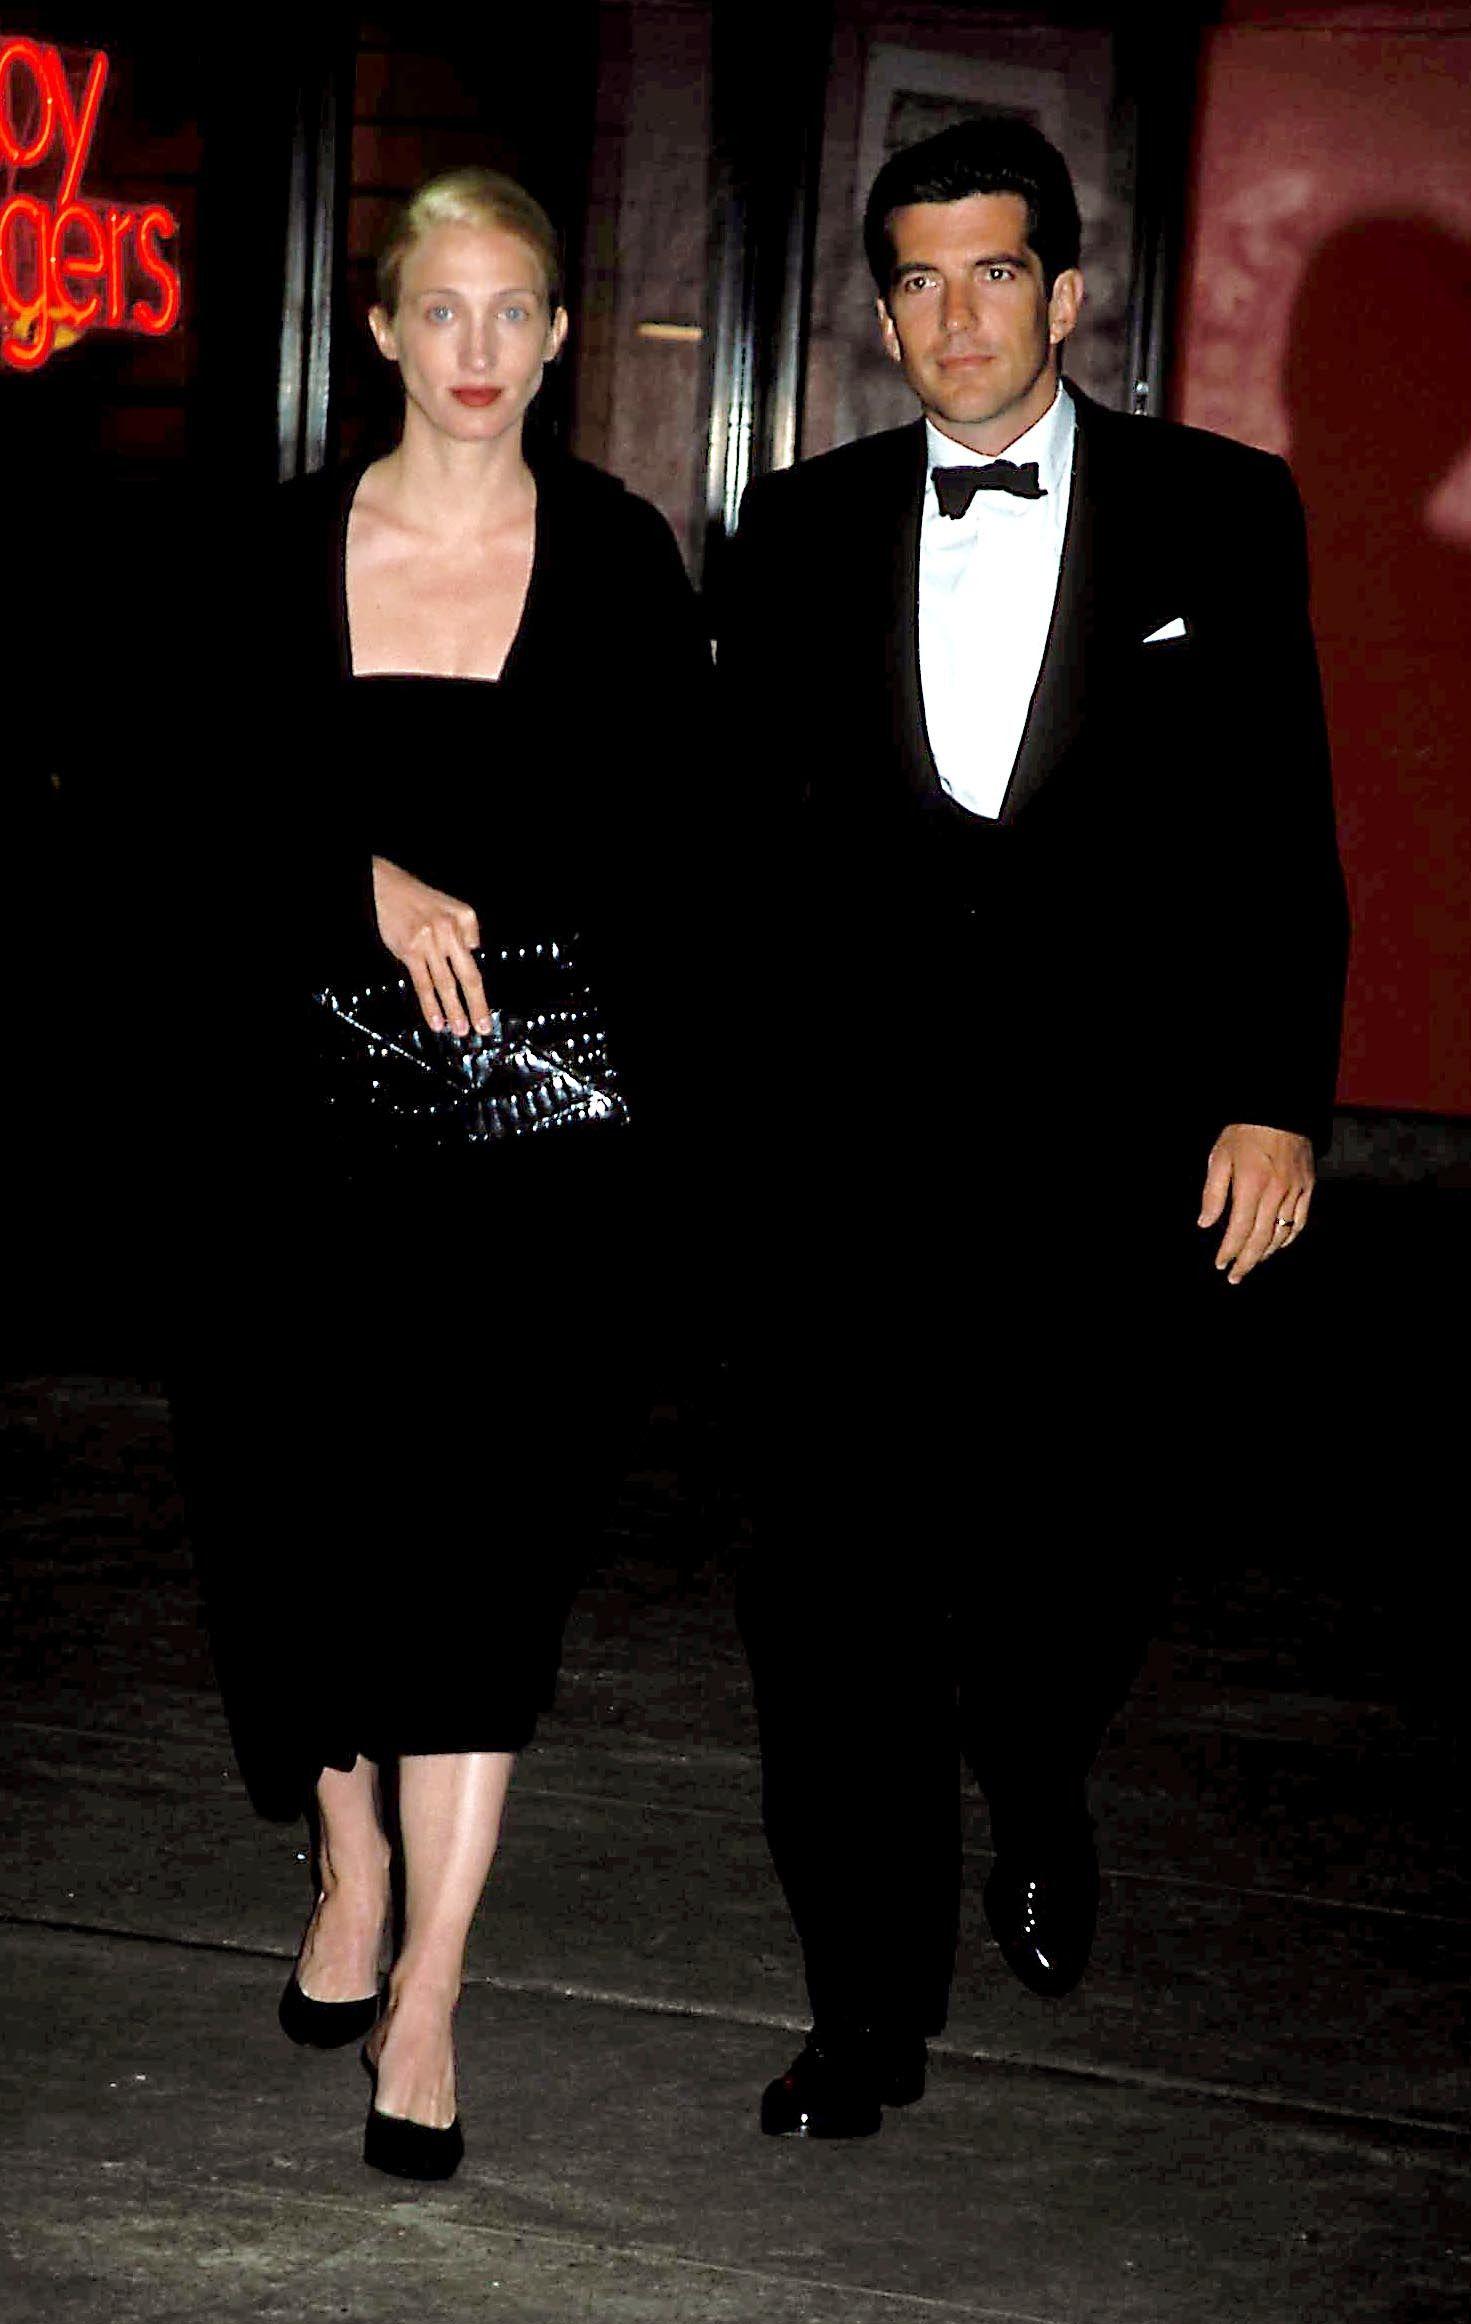 April 6, 1998 – Municipal Art Society Chairman's Evening John Kennedy Jrcarolyn  Bessette